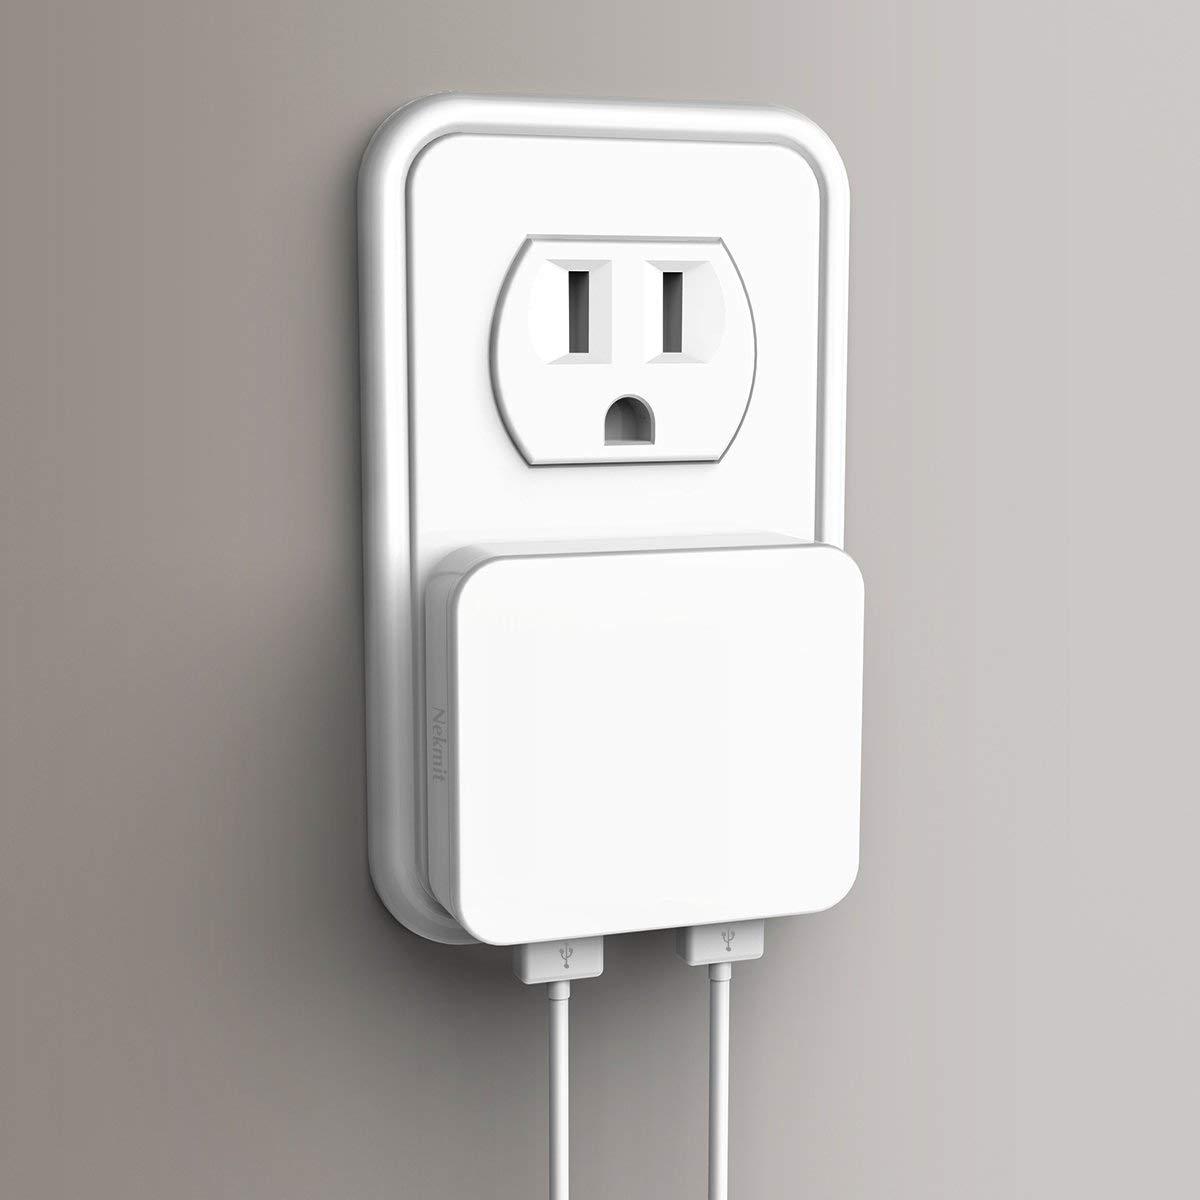 nekmit wall charger